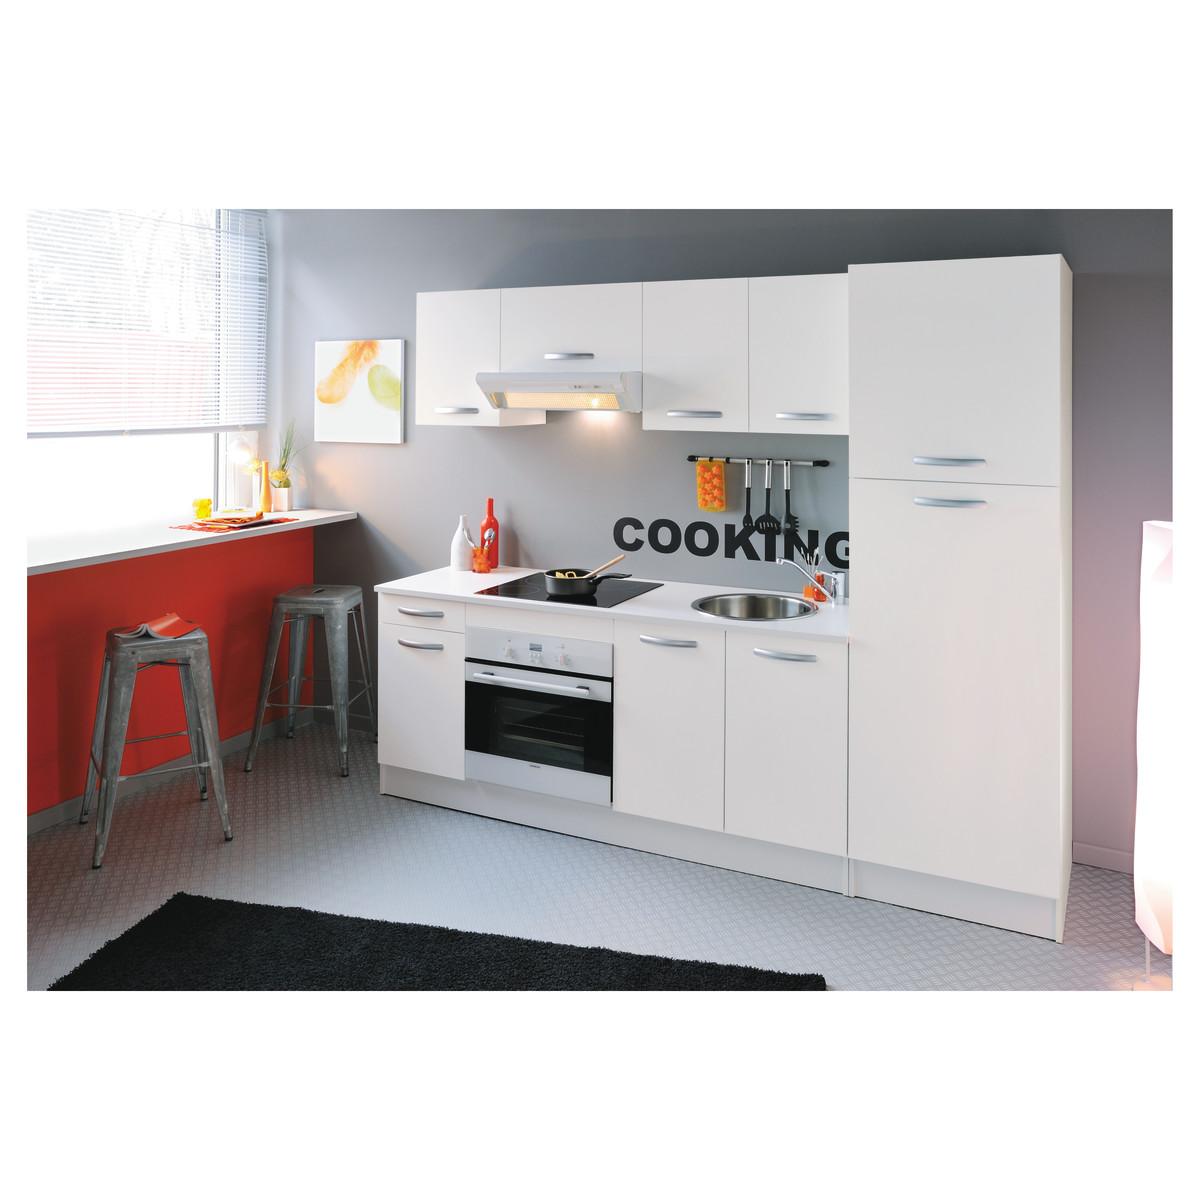 Sgabello cucina leroy merlin design inspiration f r die neueste wohnkultur - Cucina economica a legna leroy merlin ...